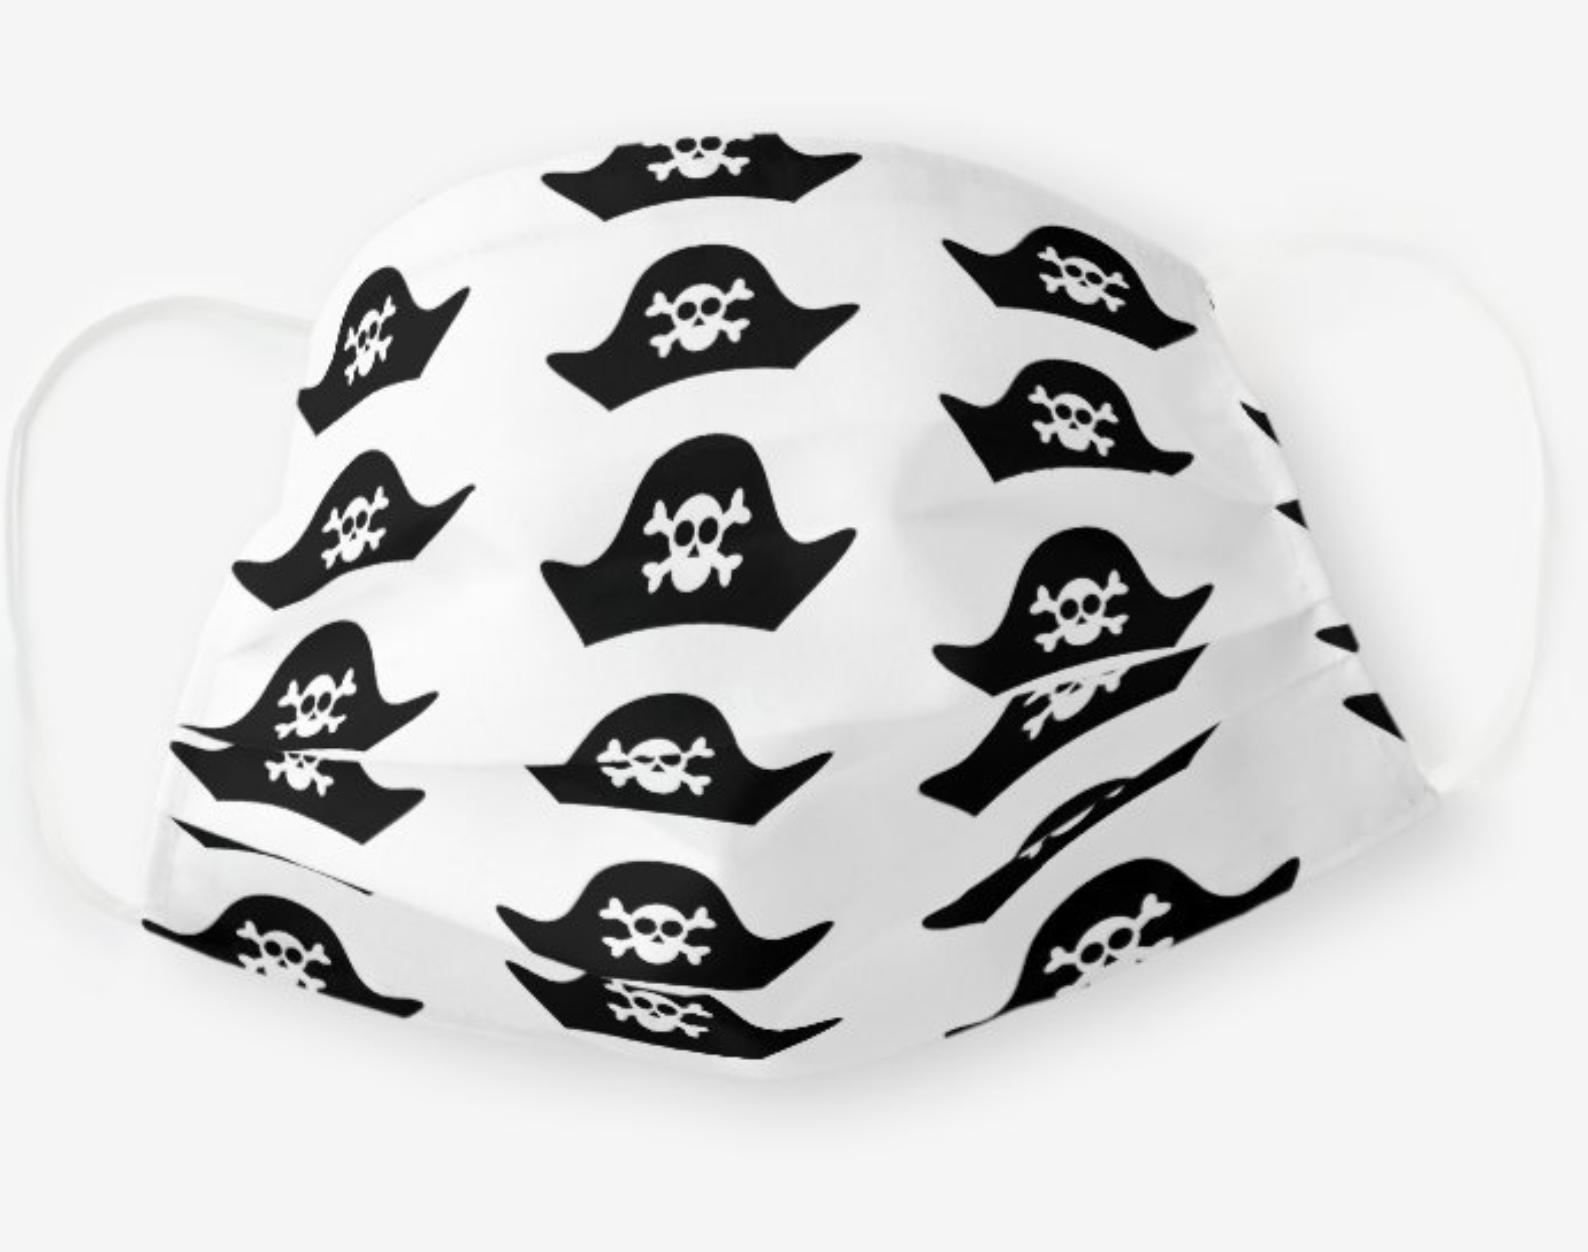 Pirate Hat Skull Crossbones Face Mask Zazzle Com In 2020 Face Mask Skull And Crossbones Pirate Hats